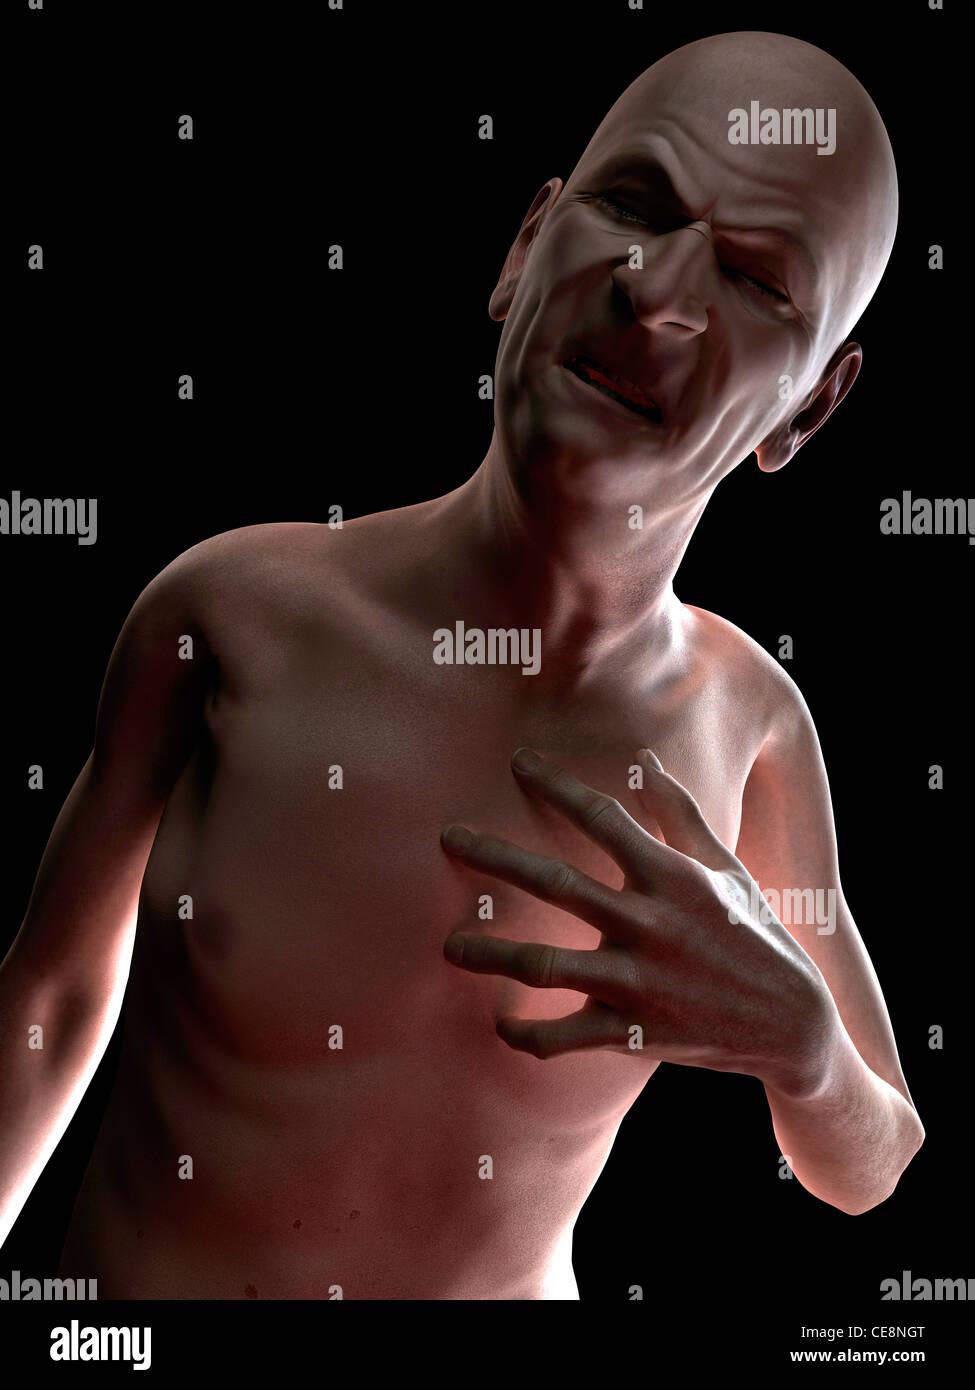 Heart attack, conceptual computer artwork. - Stock Image